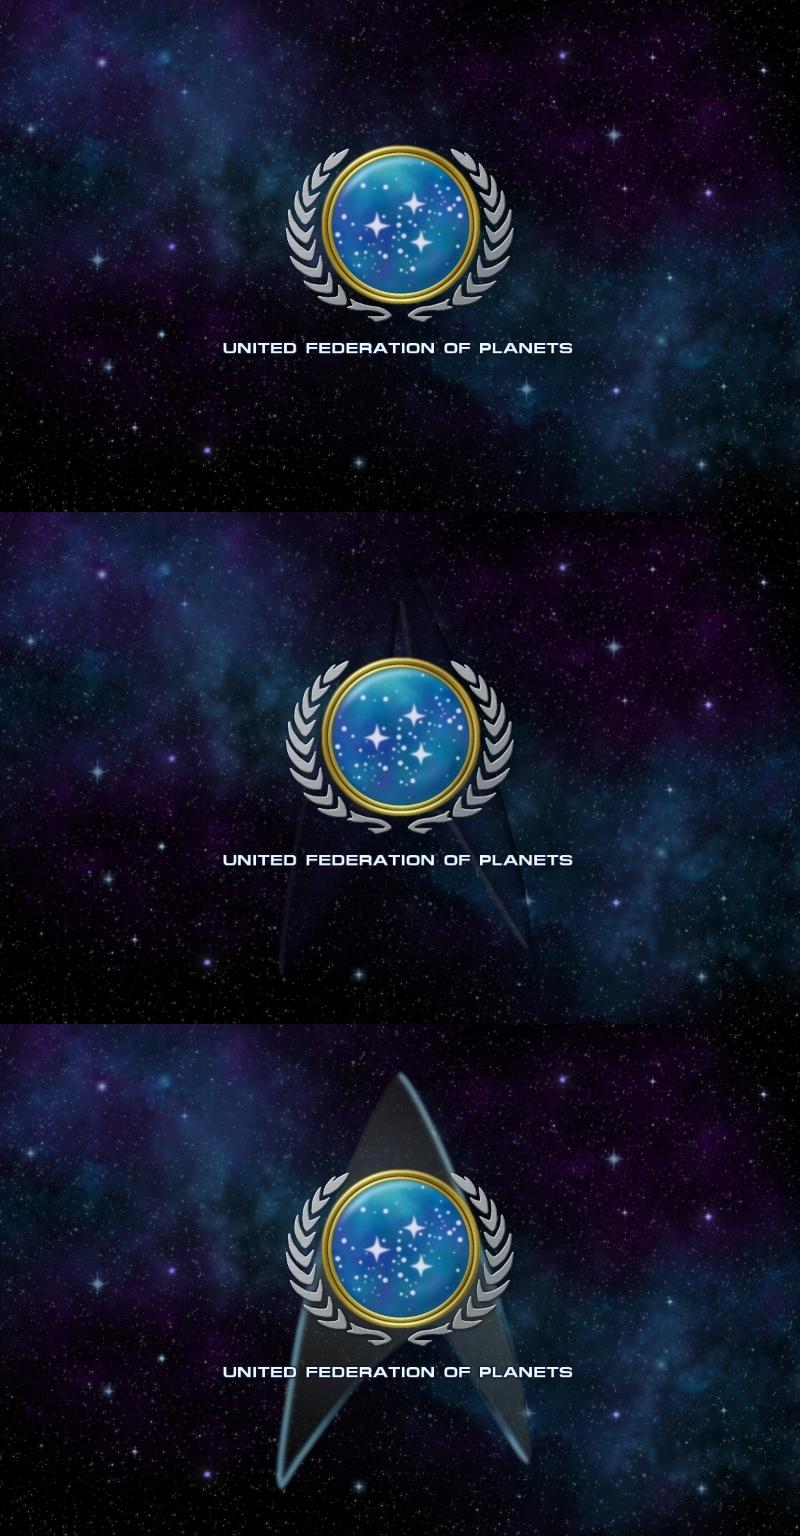 United Federation Of Planets By Samriggs On Deviantart